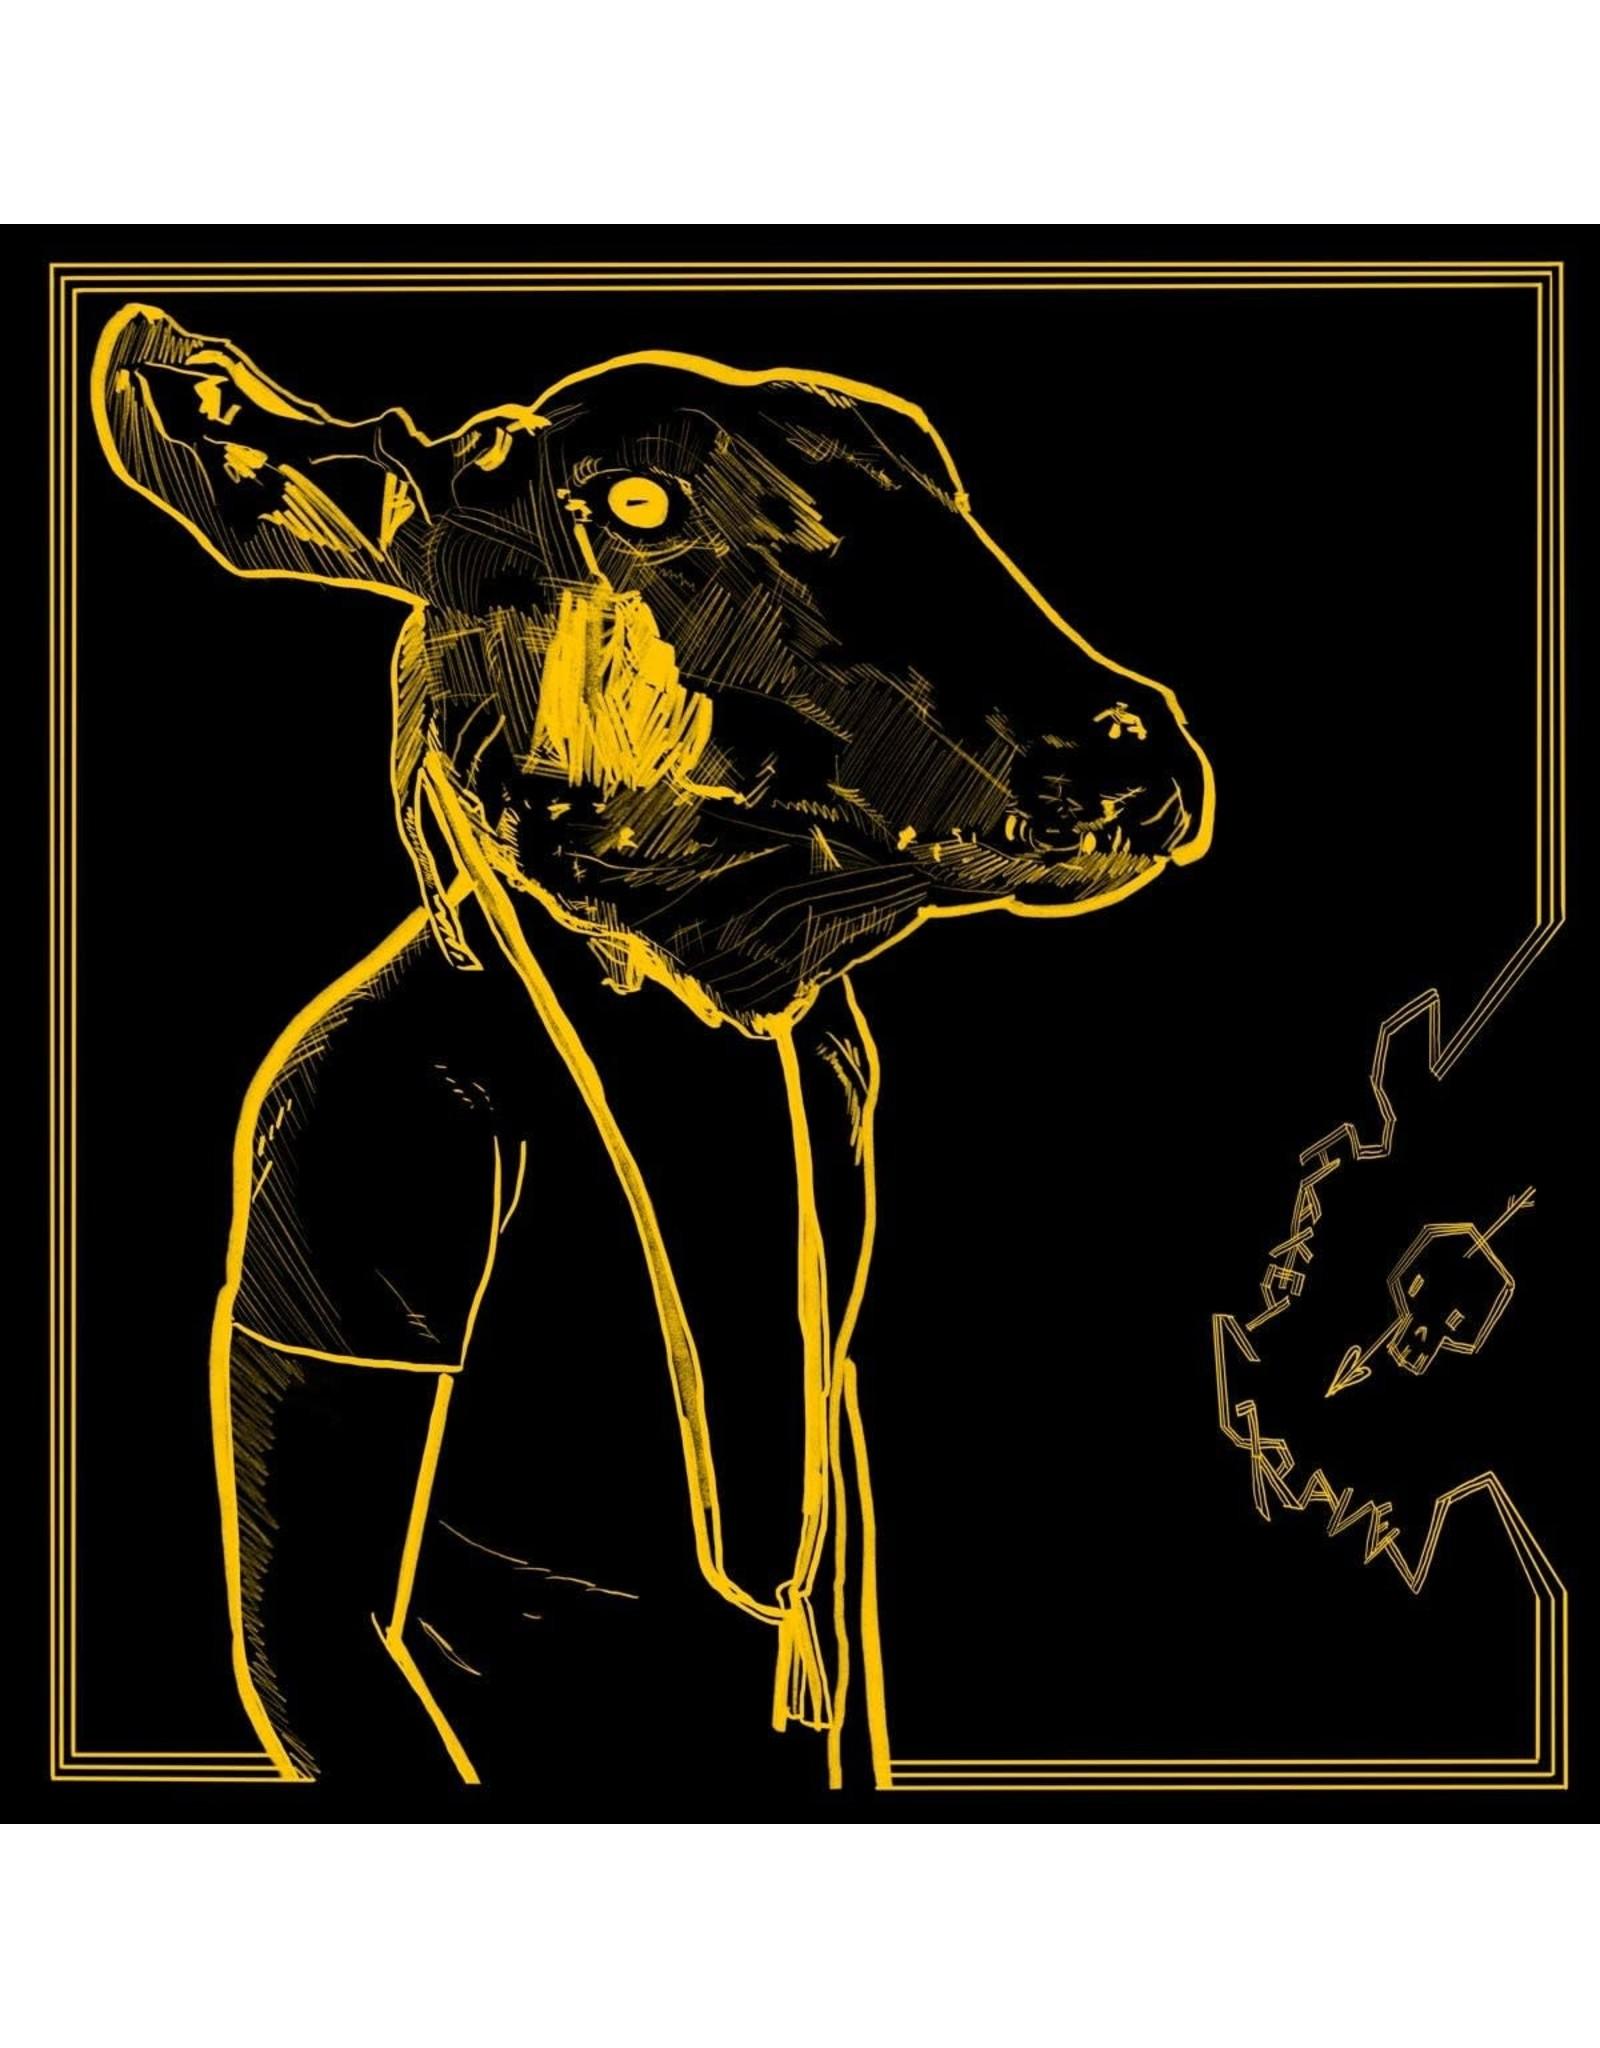 Shakey Graves - Roll The Bones X (Gold / Black Vinyl)